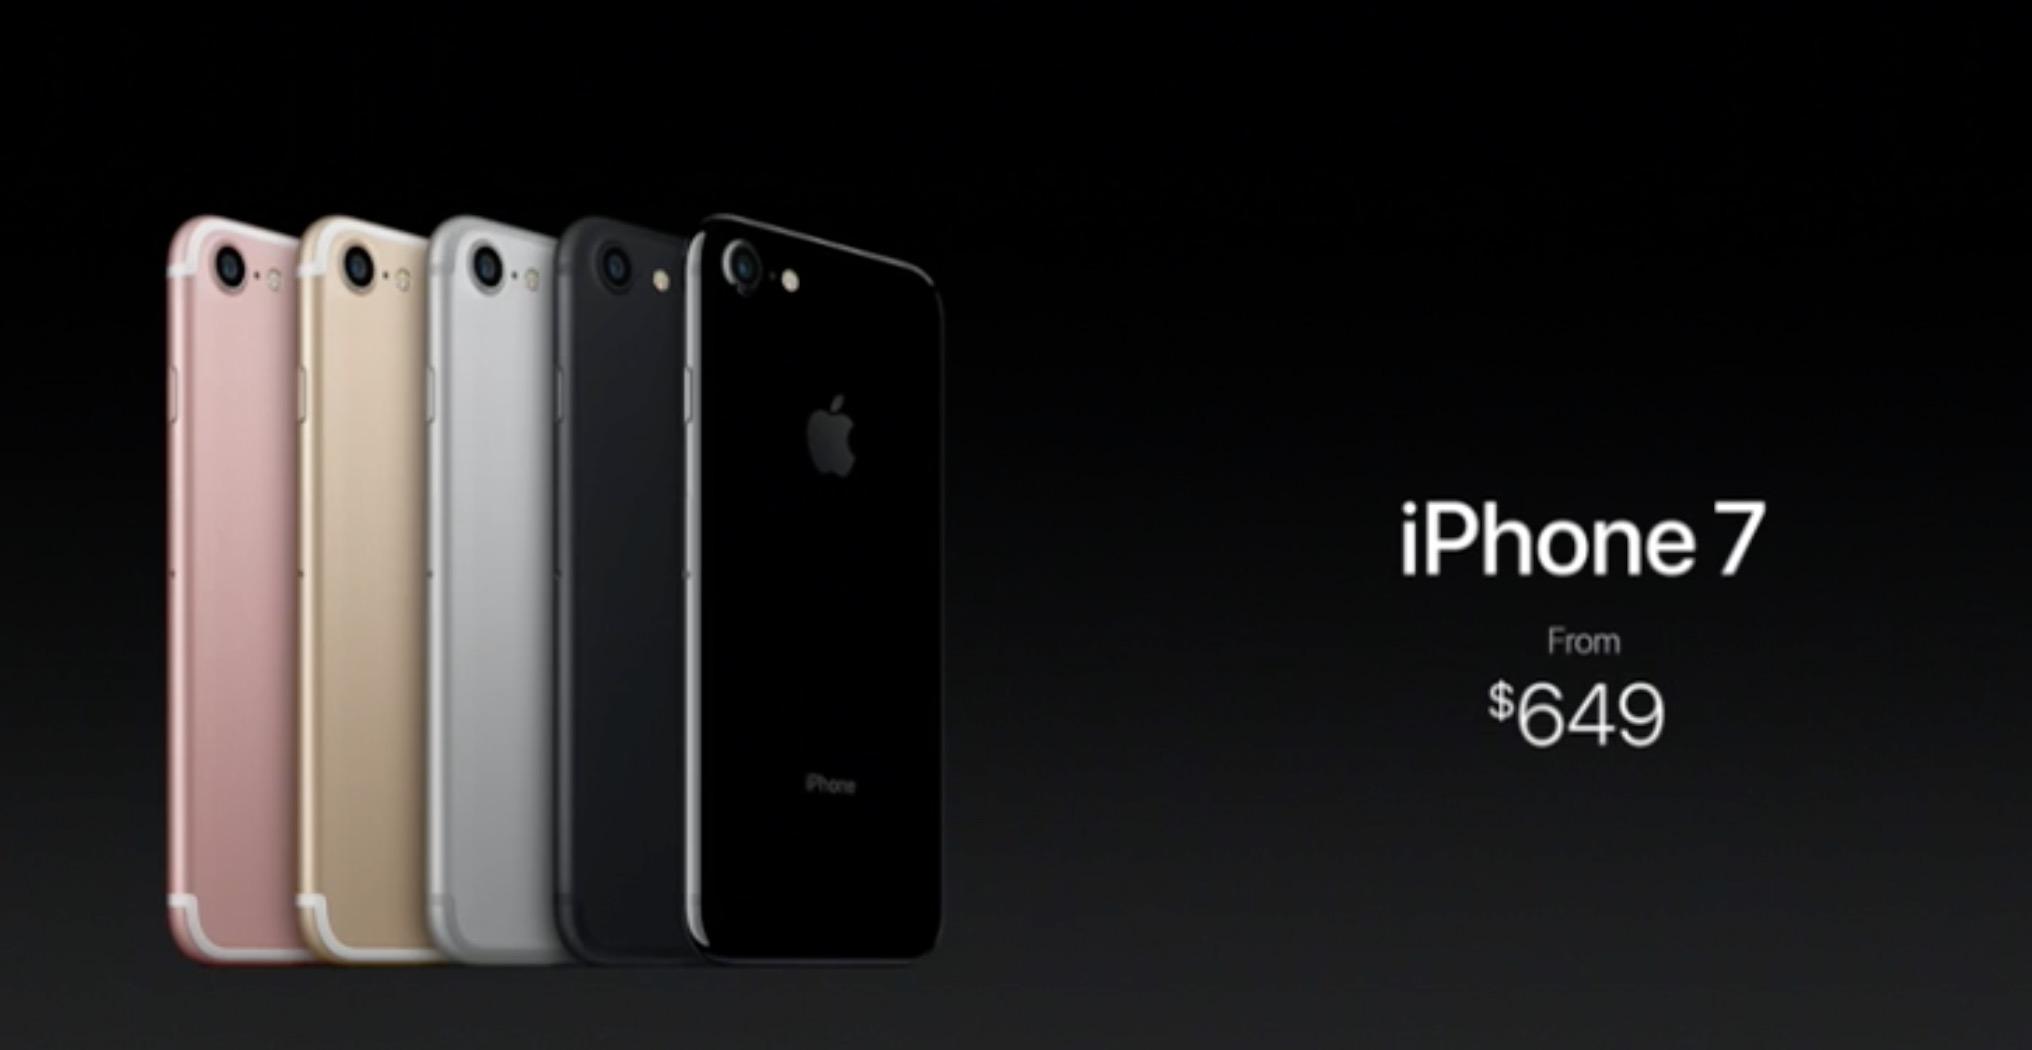 iPhone 7 prezzo